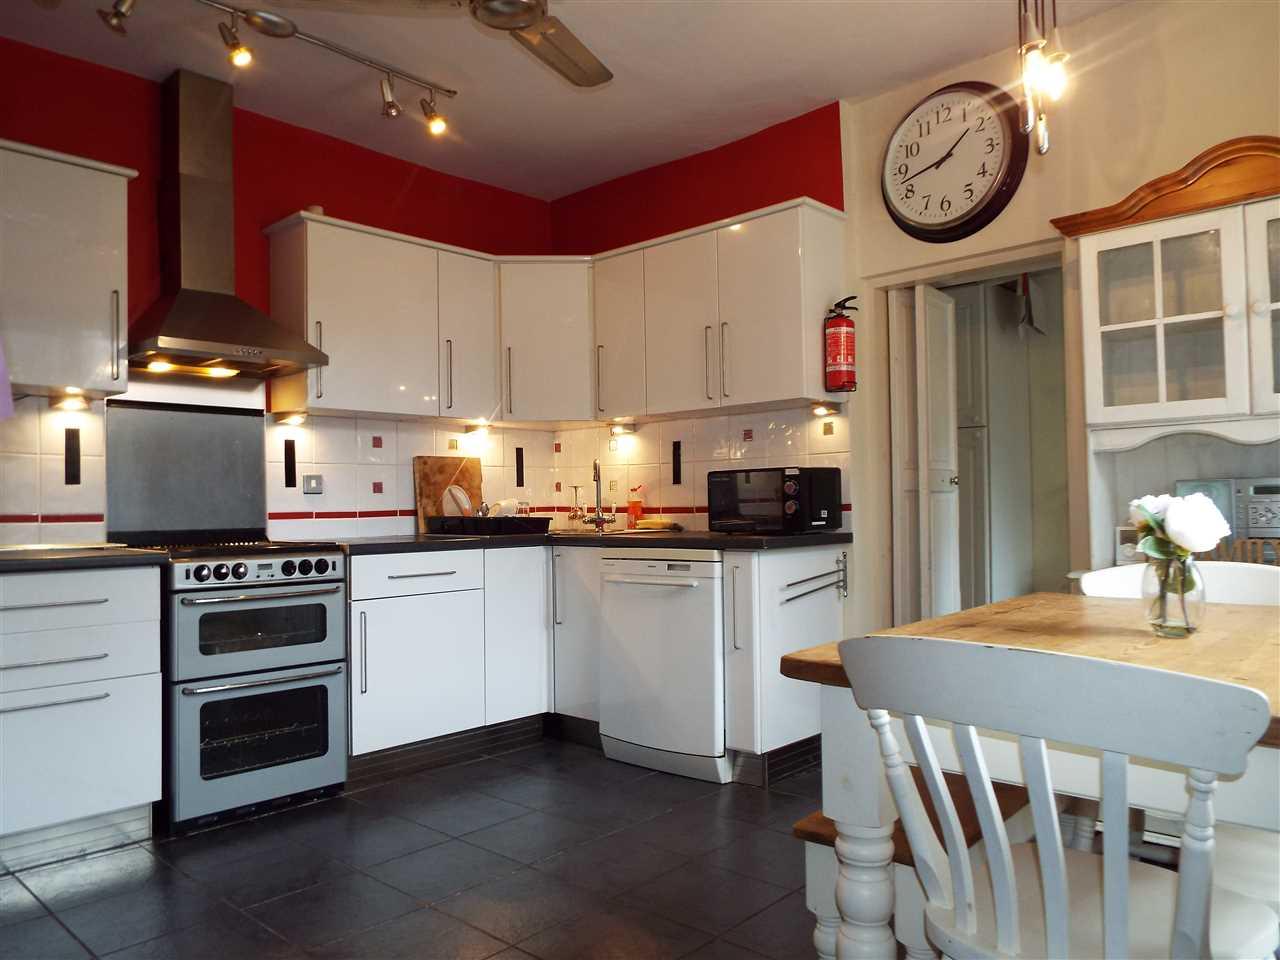 3 bed end-of-terrace for sale in Park Road, Adlington, Adlington 12